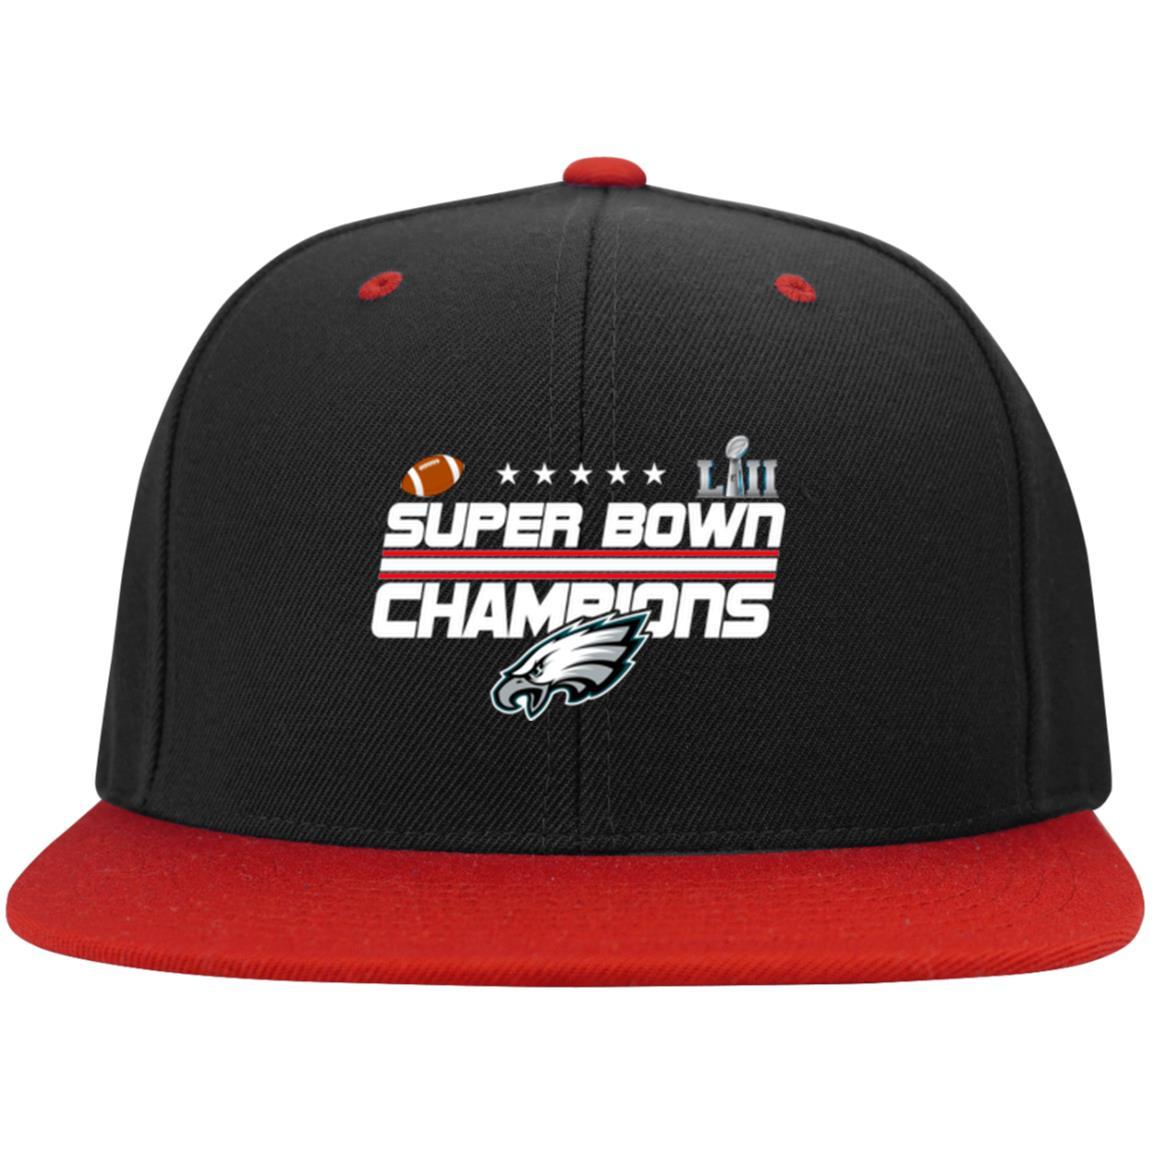 image 262 - Eagles Super Bowl Champions Hats